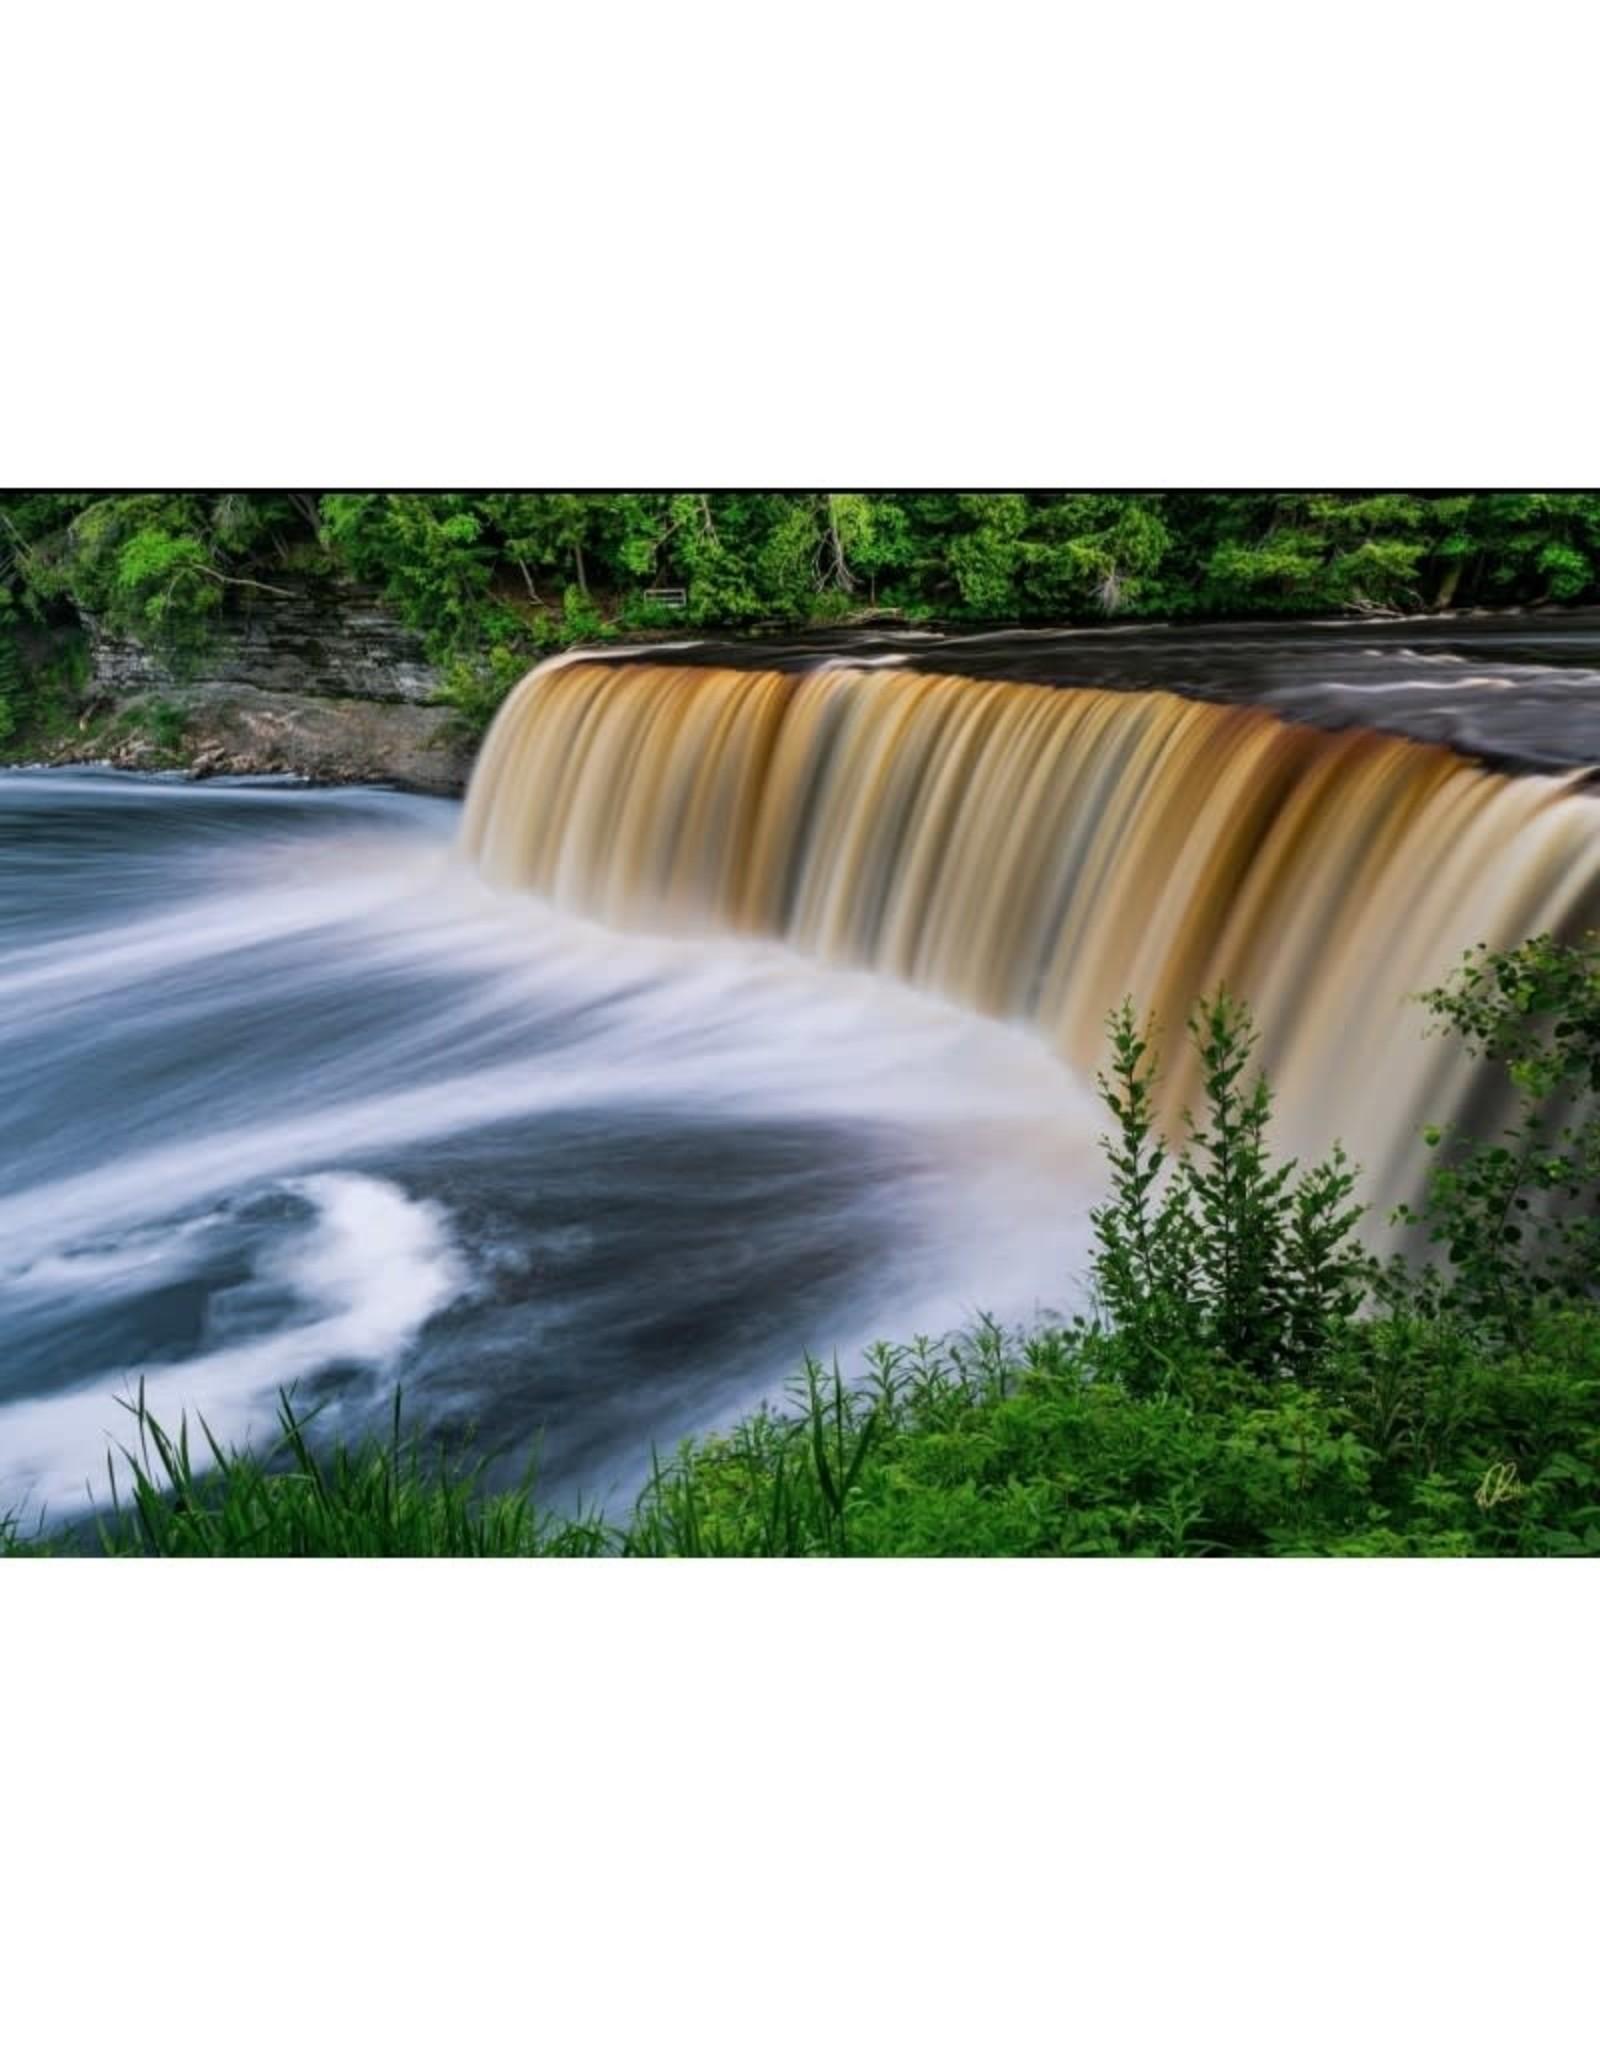 Nick Irwin Images Tahquamenon Falls